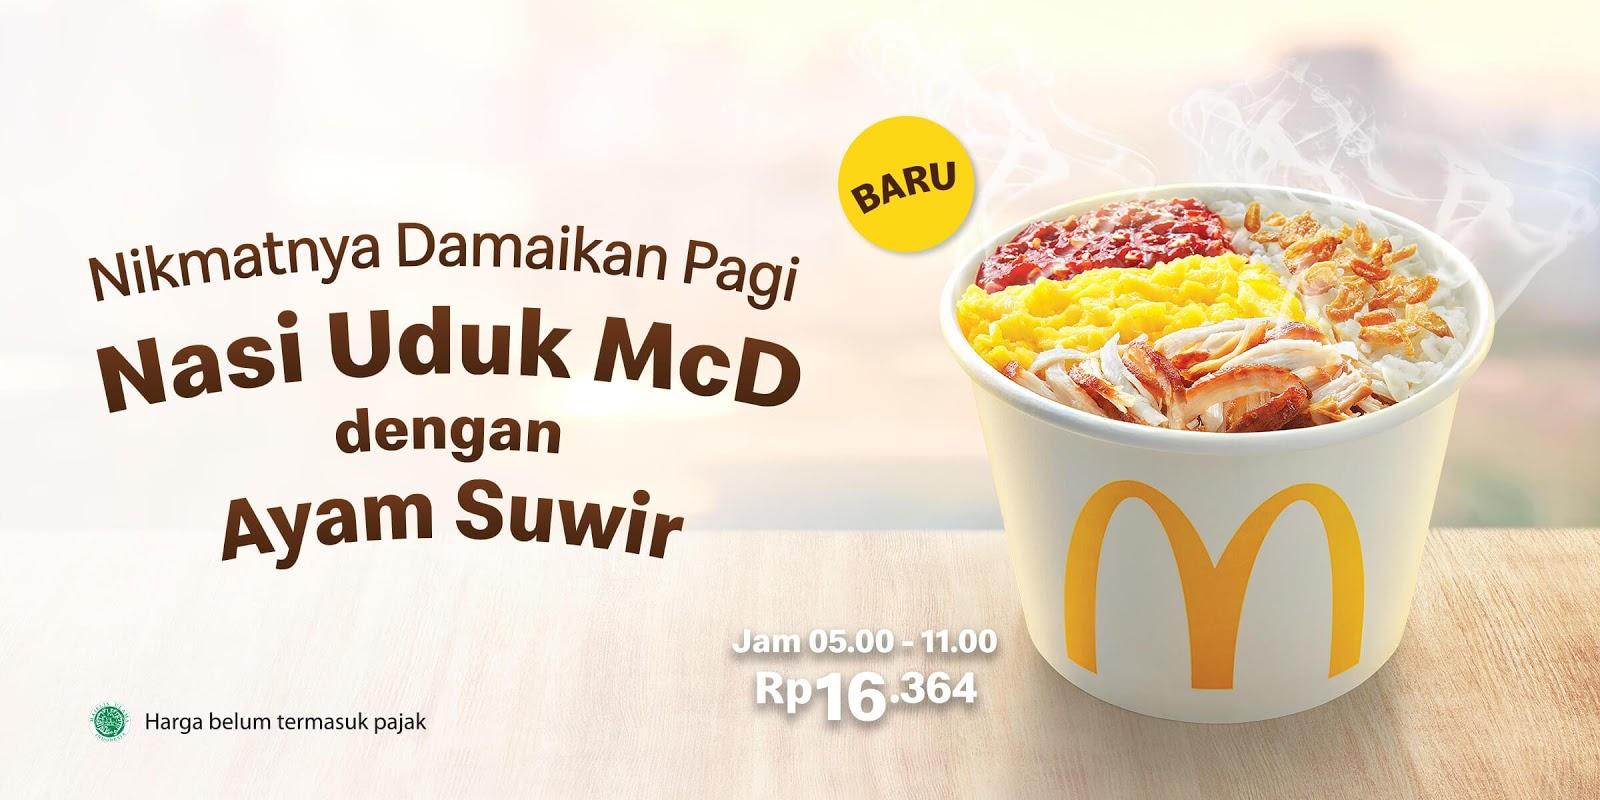 McDonalds Promo Nasi Uduk McD + Ayam Suwir Harga Hanya Rp 16.364